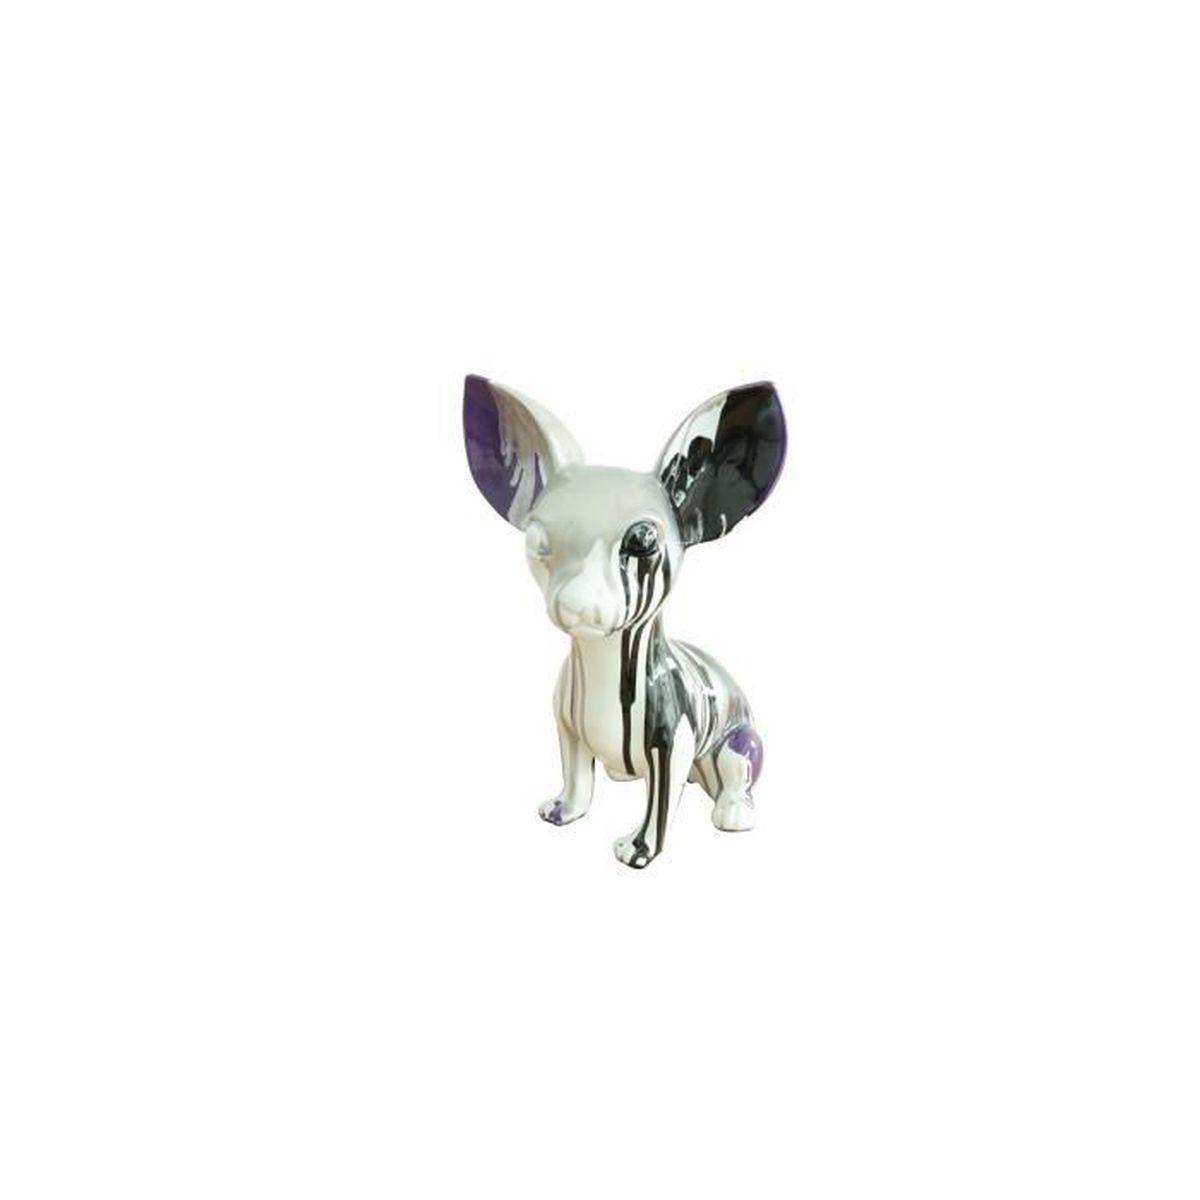 statue chihuahua d co moderne noir violet gris tendance art moderne achat vente statue. Black Bedroom Furniture Sets. Home Design Ideas